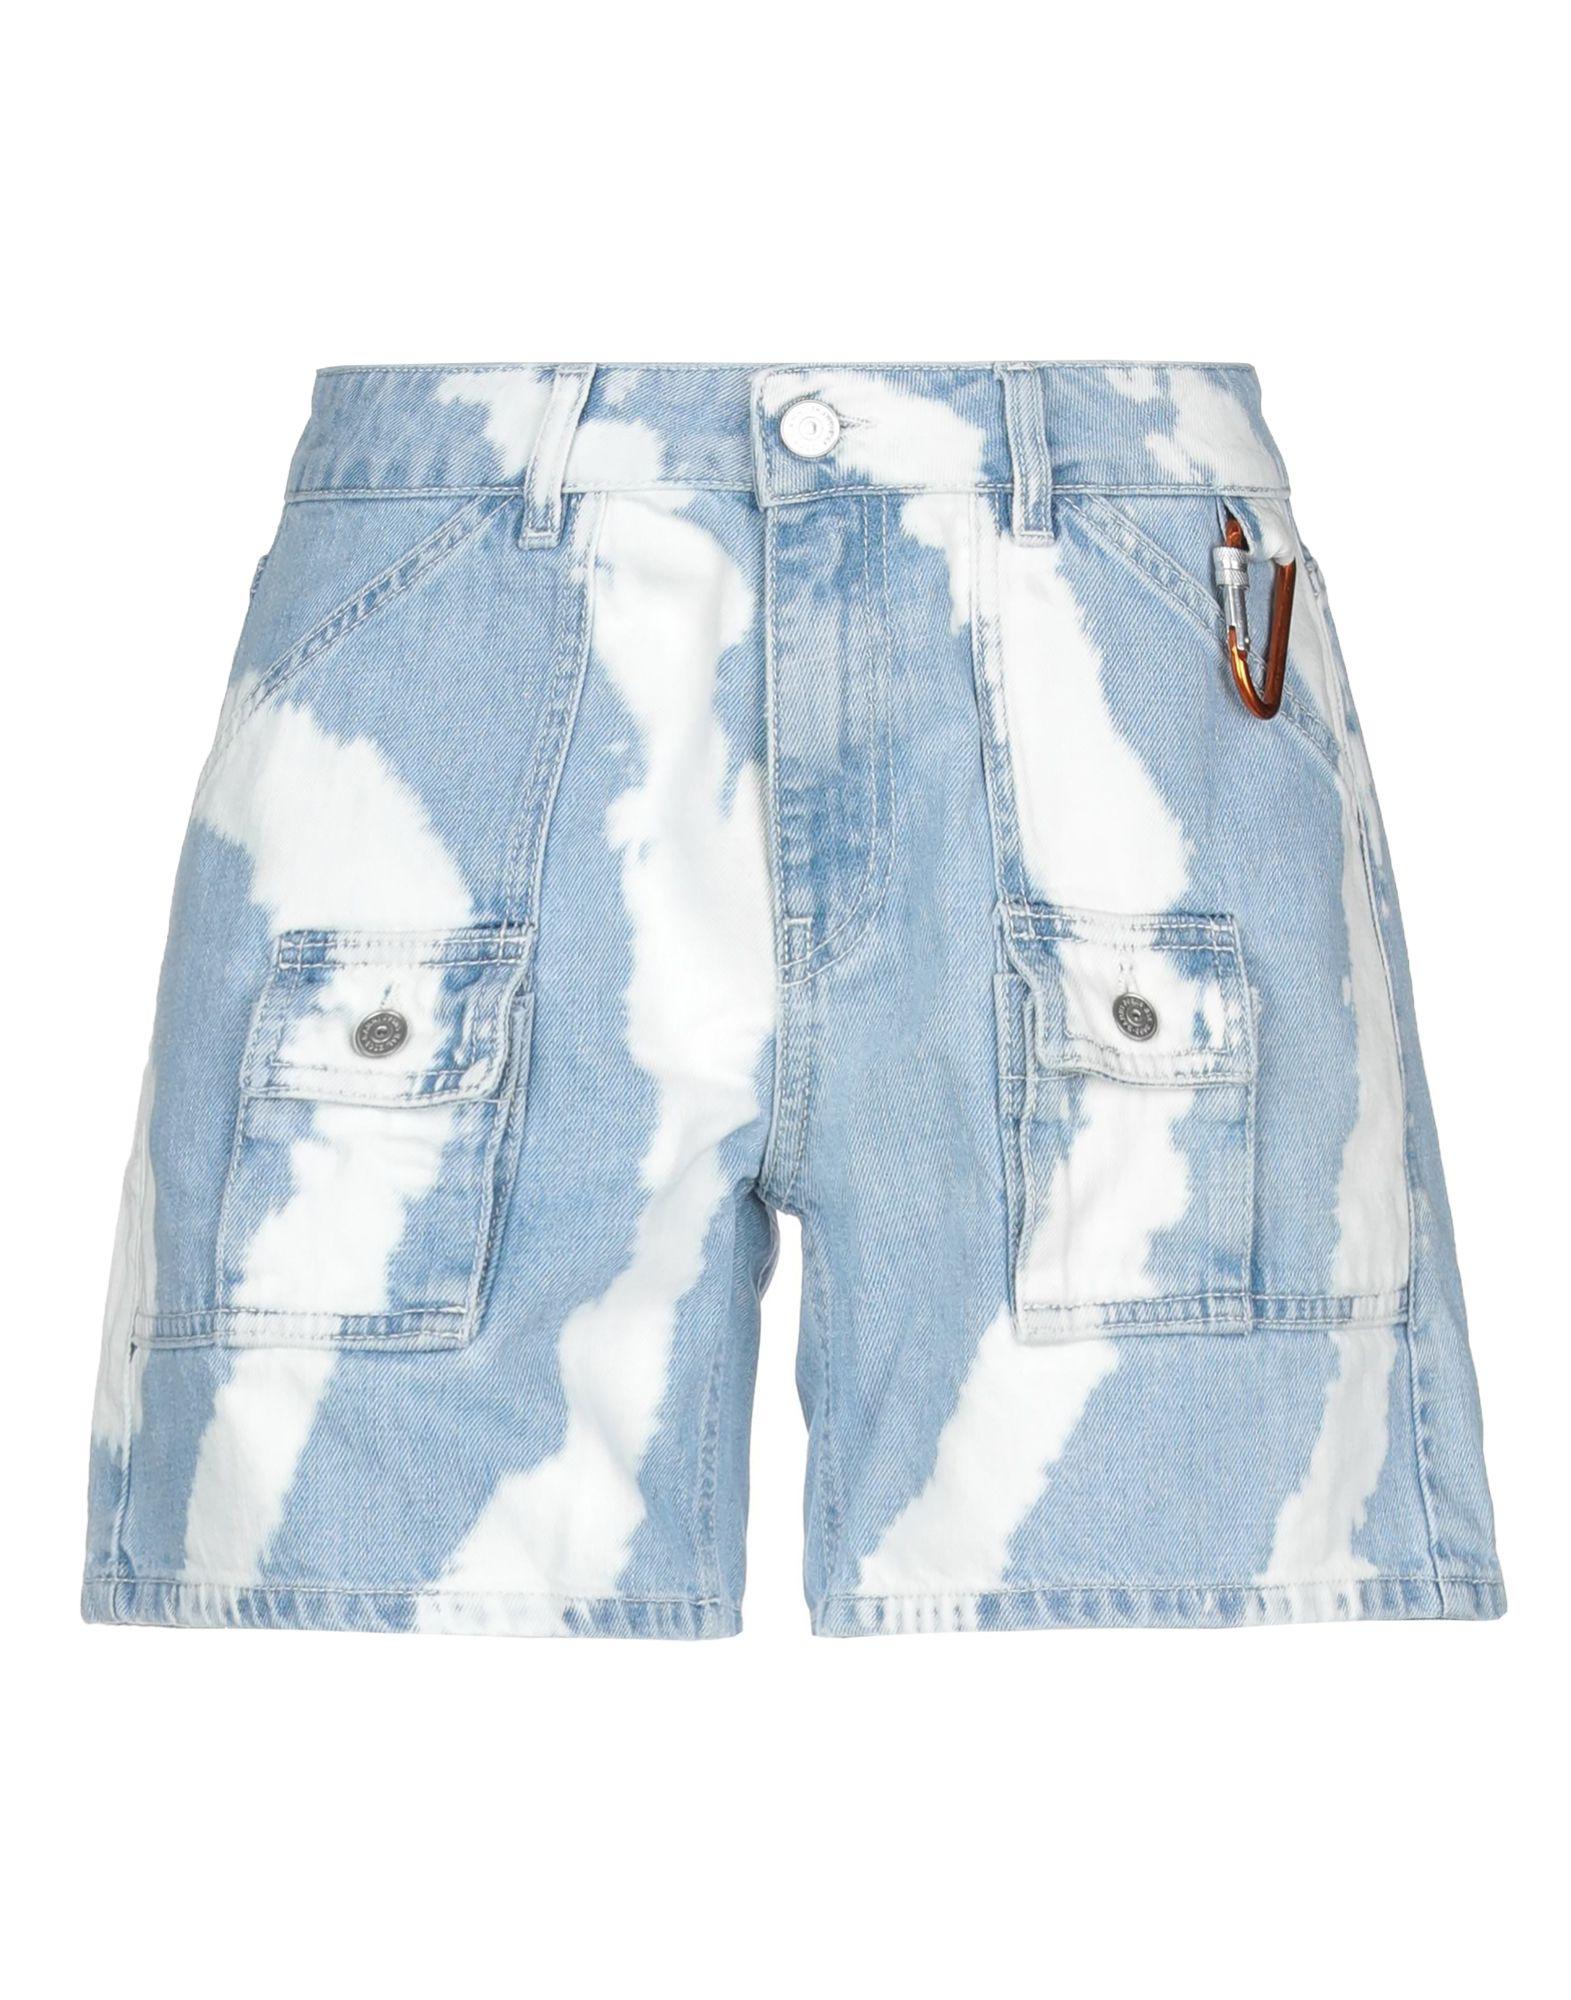 GANNI Denim shorts. denim, detachable application, two-tone, light wash, low waisted, front closure, button, zip, multipockets. 100% Cotton